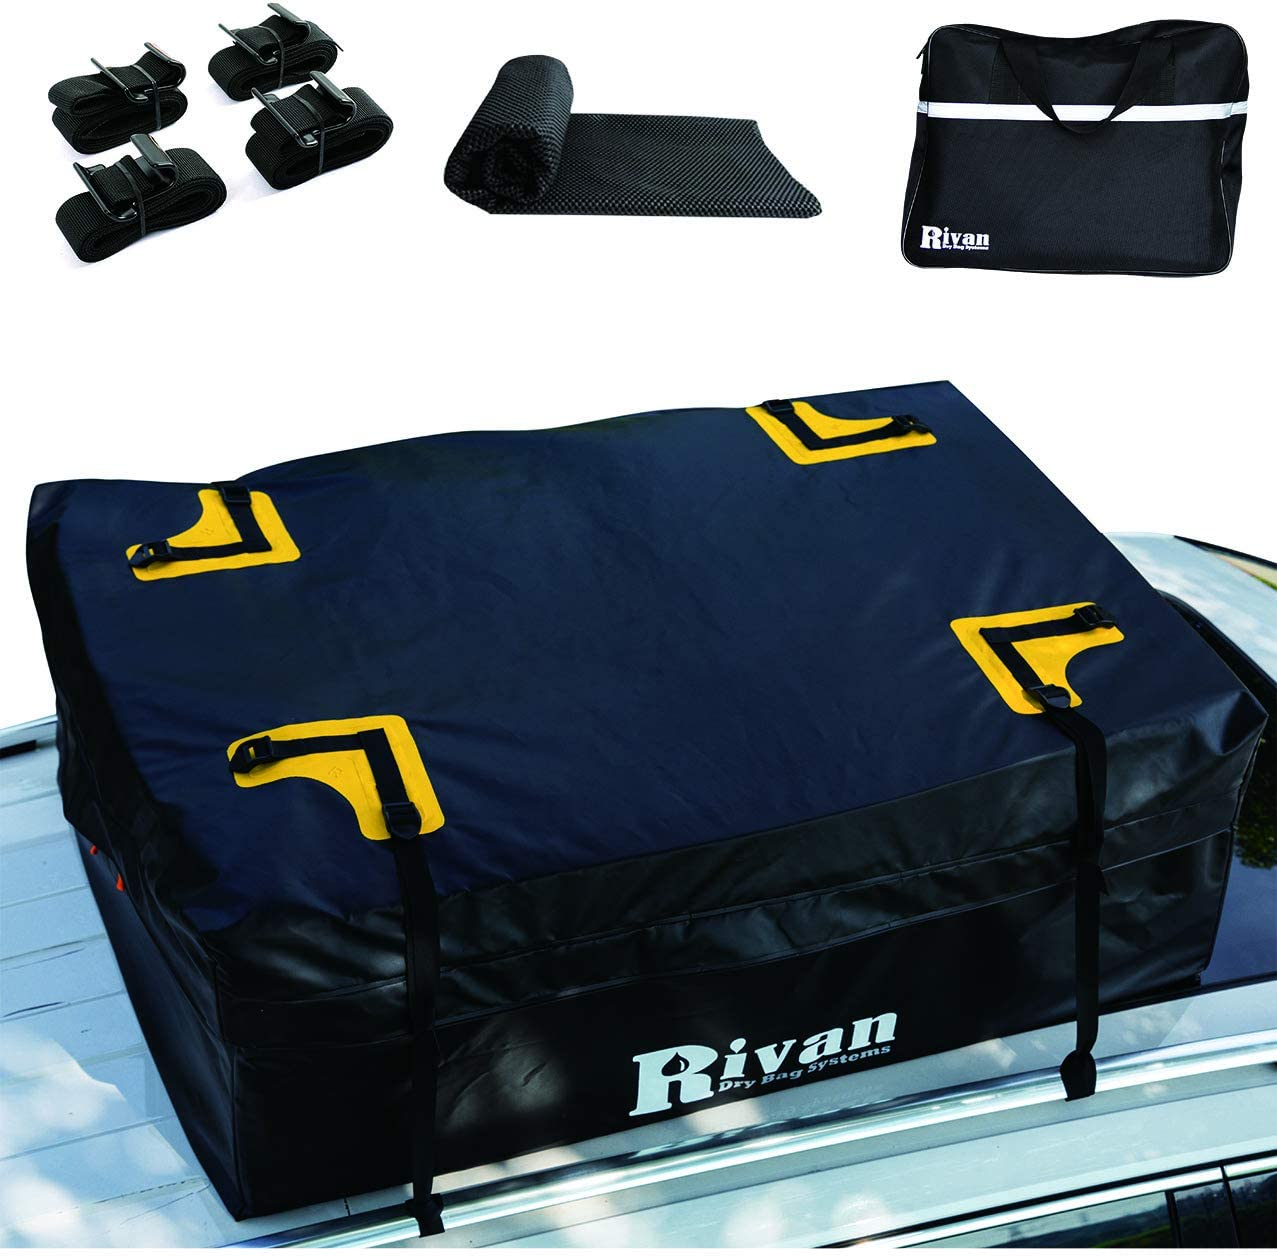 Waterproof Zipper and Rain Flap RIVAN 100/% Waterproof Car Rooftop Cargo Carrier Bag 15 cu ft